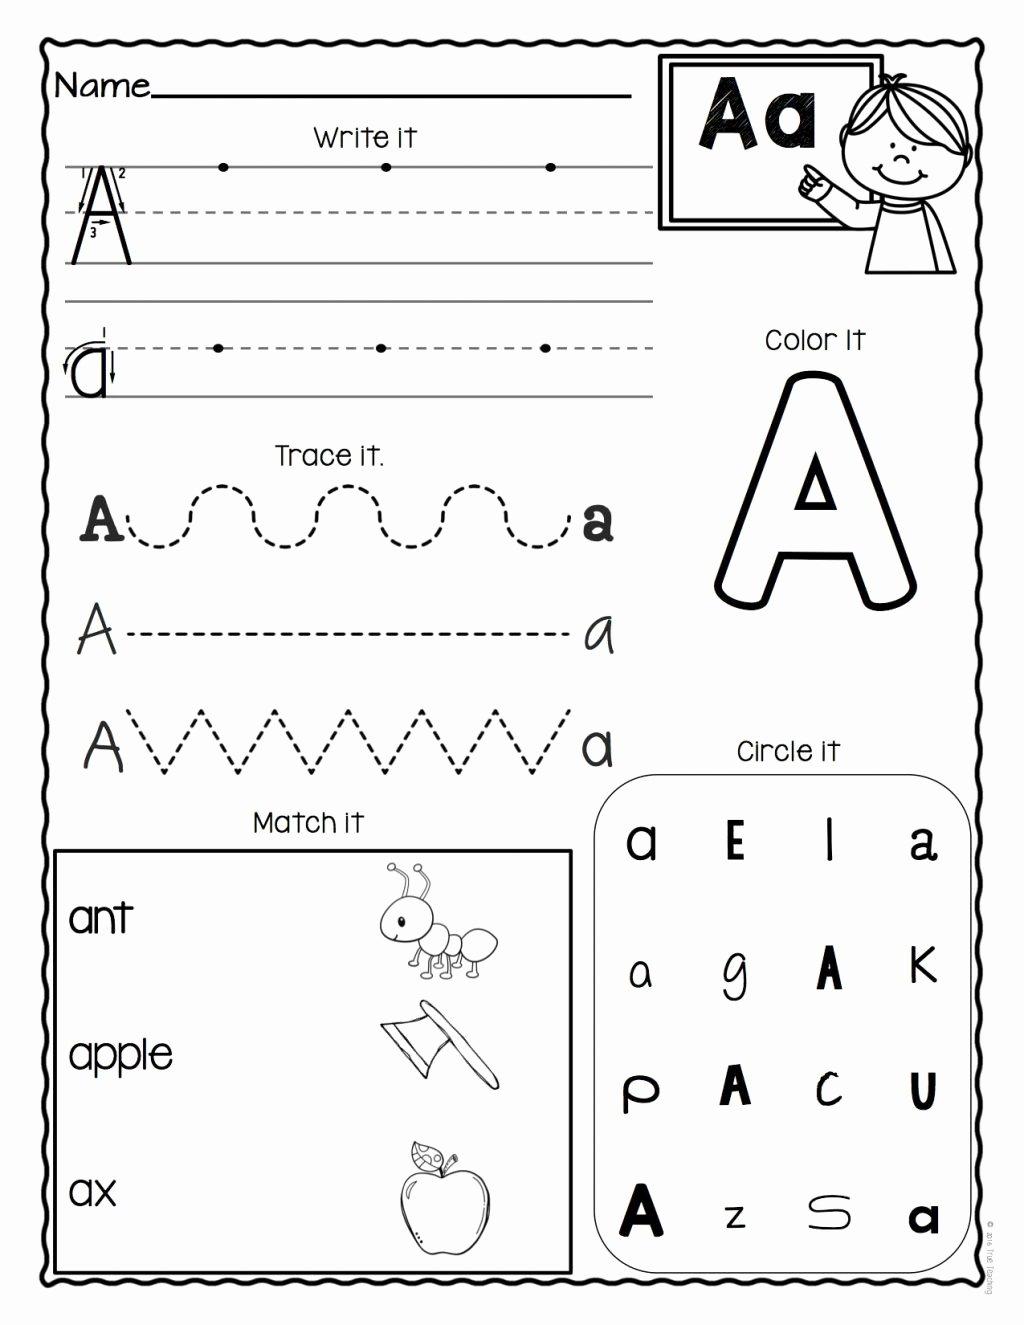 Printable Alphabet Worksheets for Preschoolers Printable Worksheet Alphabet Worksheets for Kindergarten